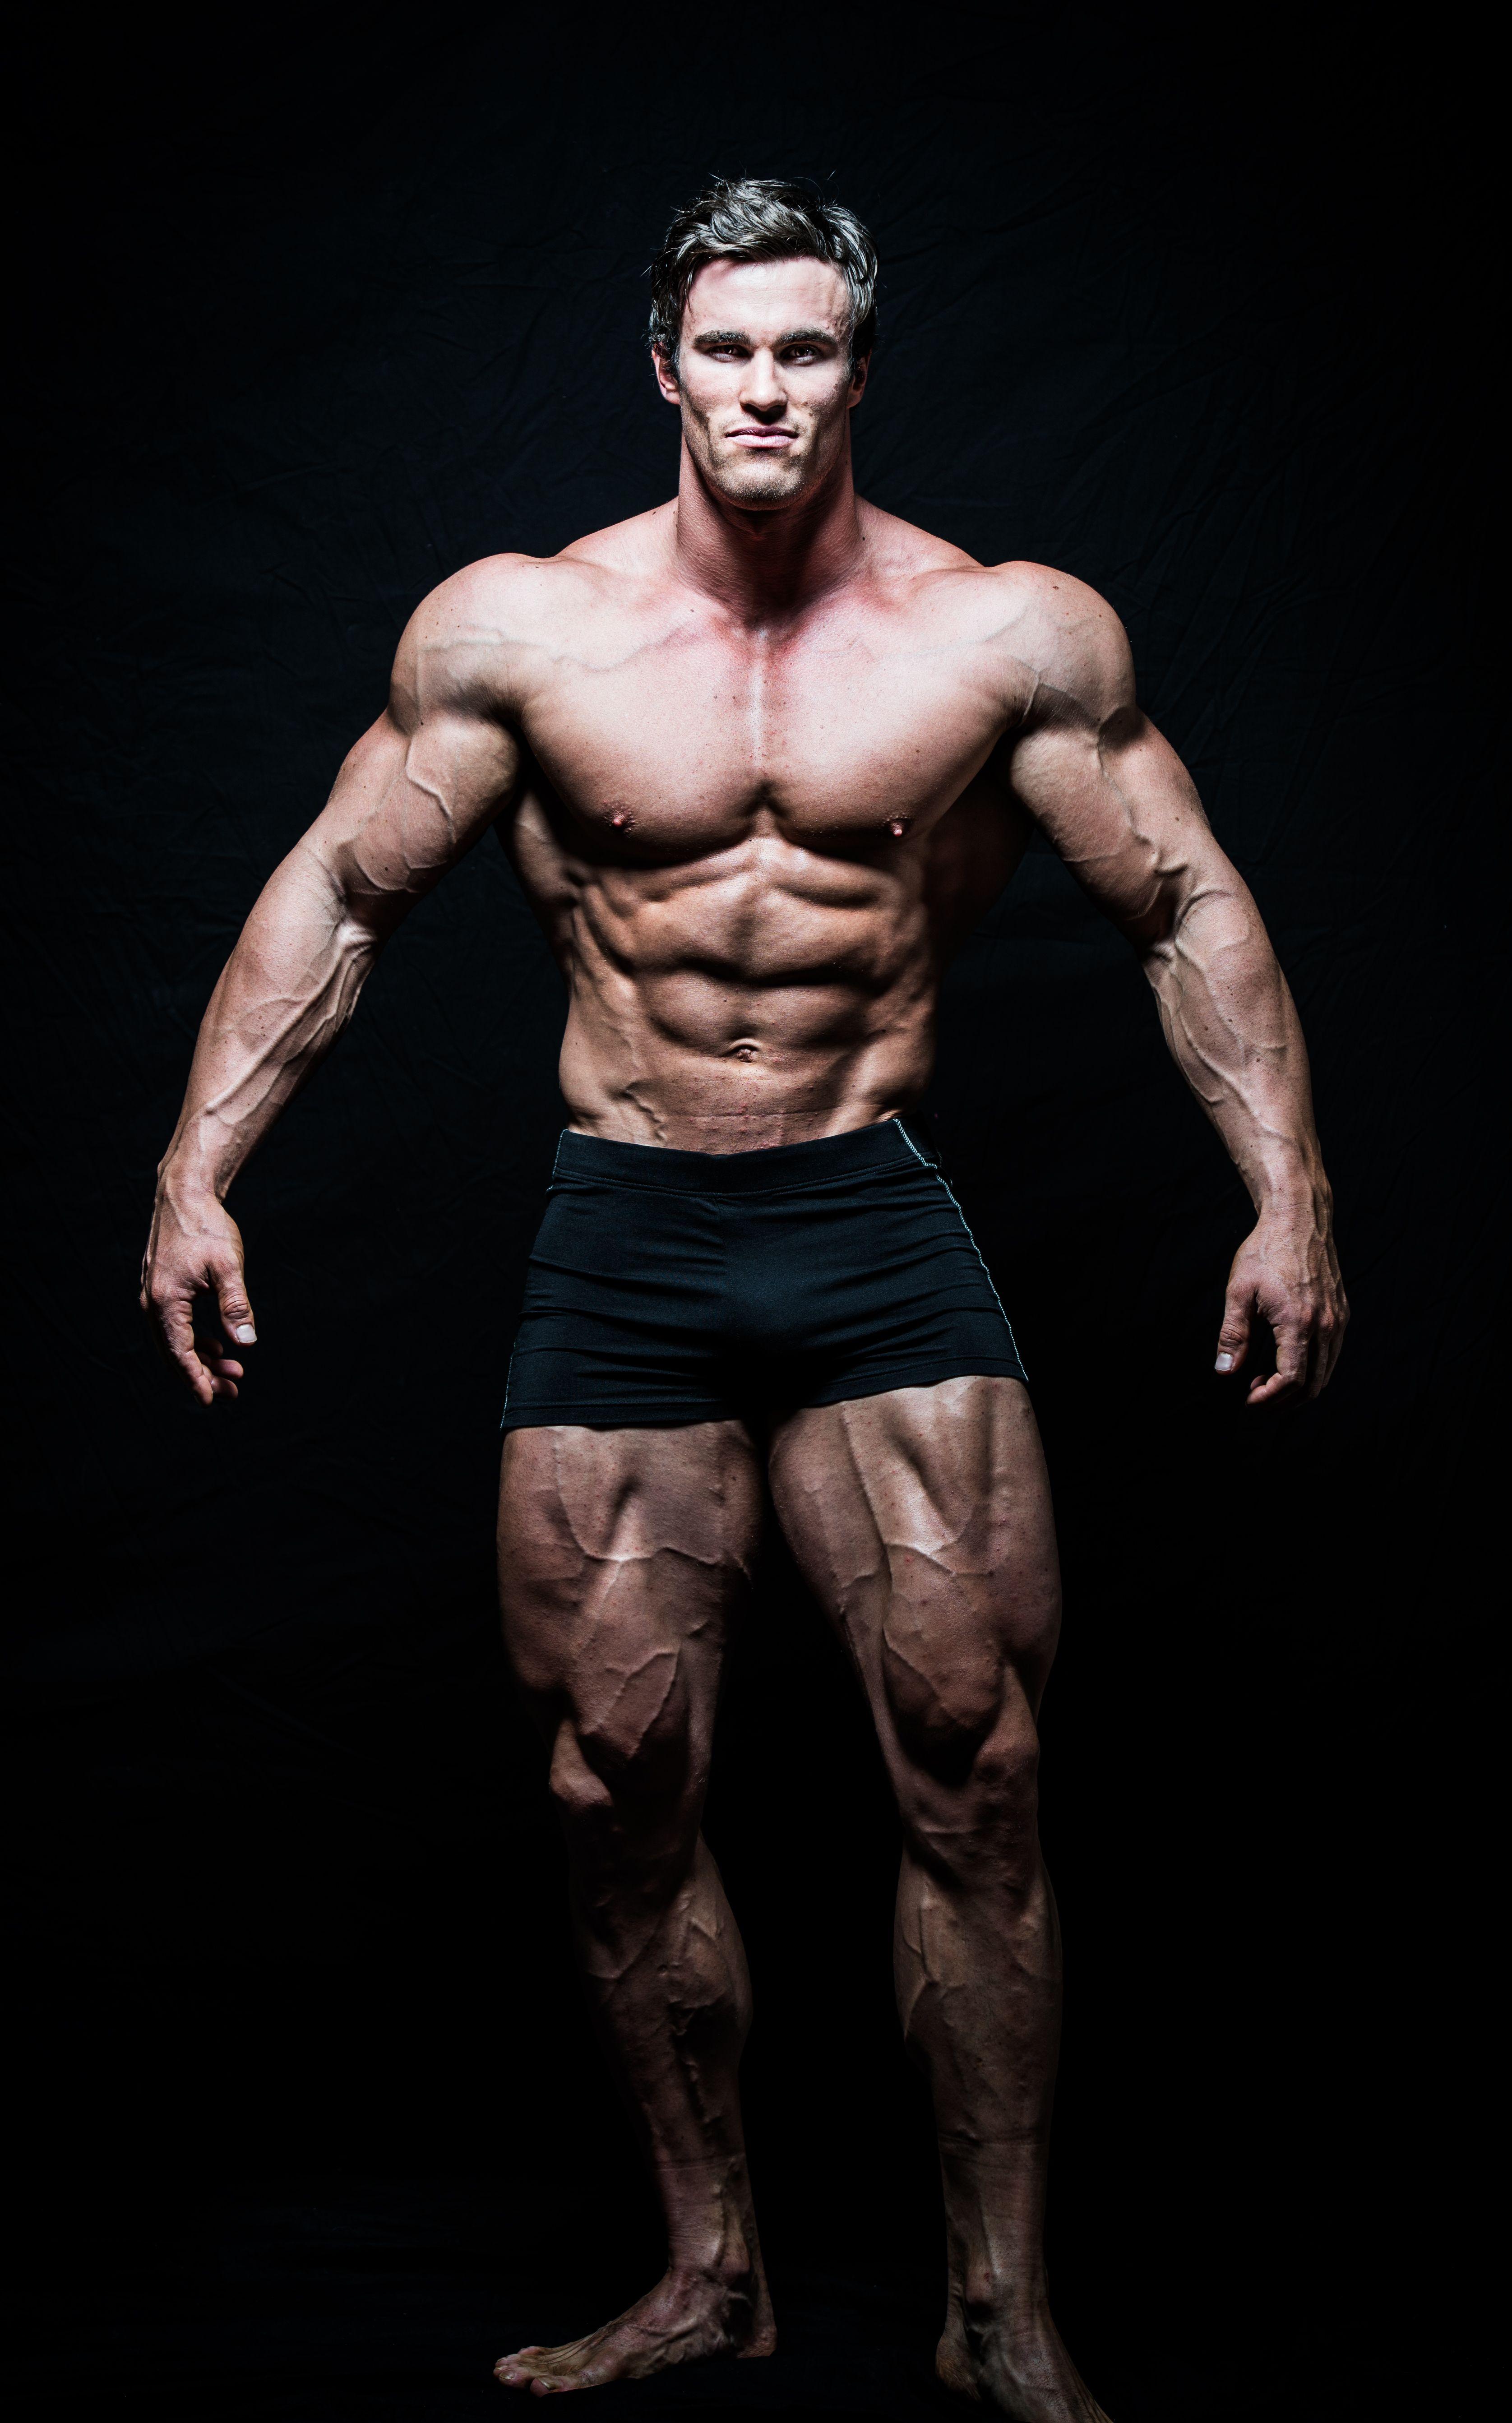 Arnold Schwarzenegger Bodybuilding Pose | www.pixshark.com